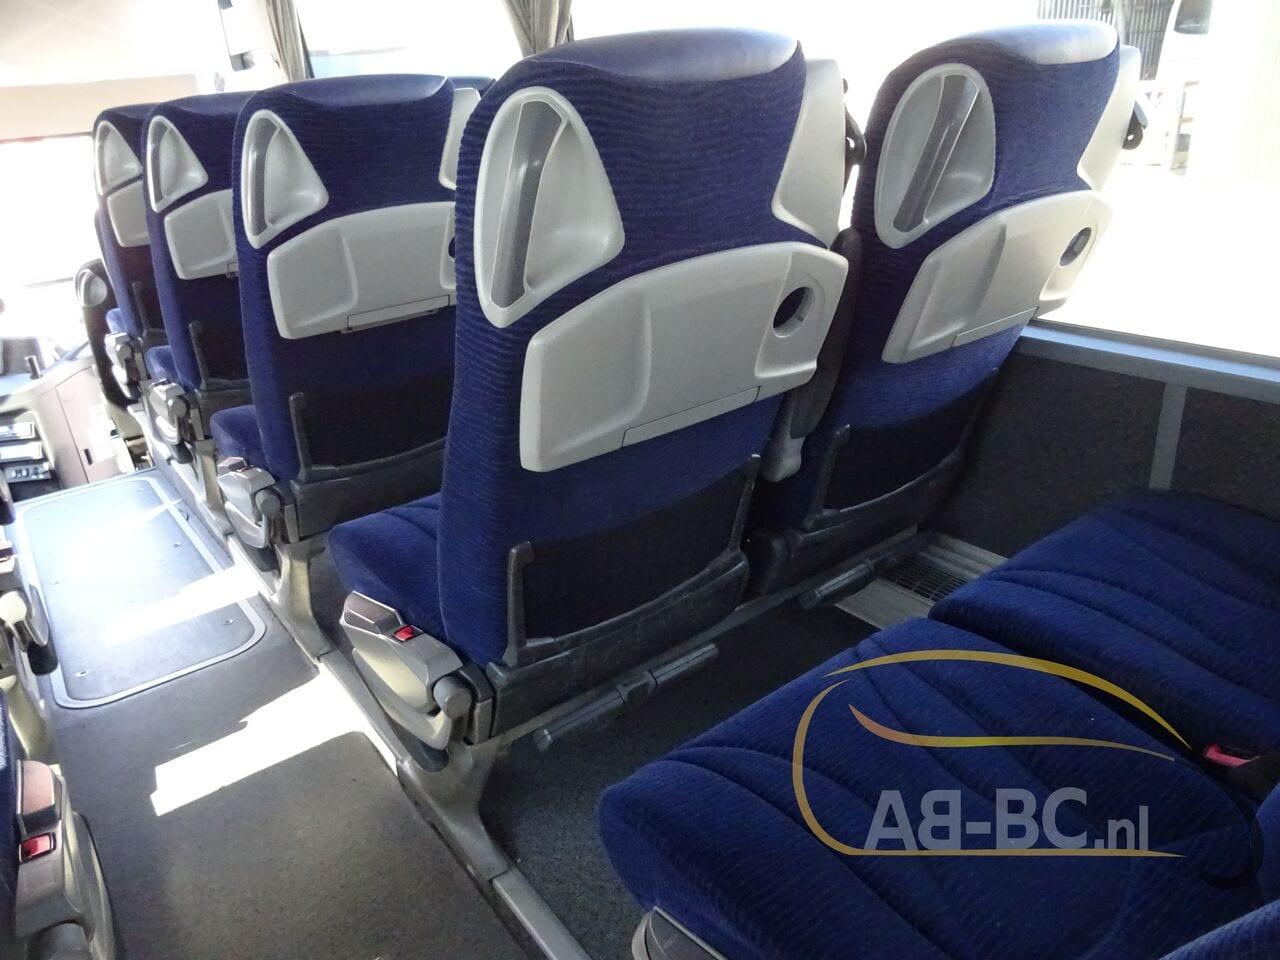 coach-busSETRA-S415-GT-HD-FINAL-EDITION-51-SEATS-LIFTBUS---1620382149982411259_big_9a790a453c5ba8c56e931febe80ce4e0--21050713010665719300